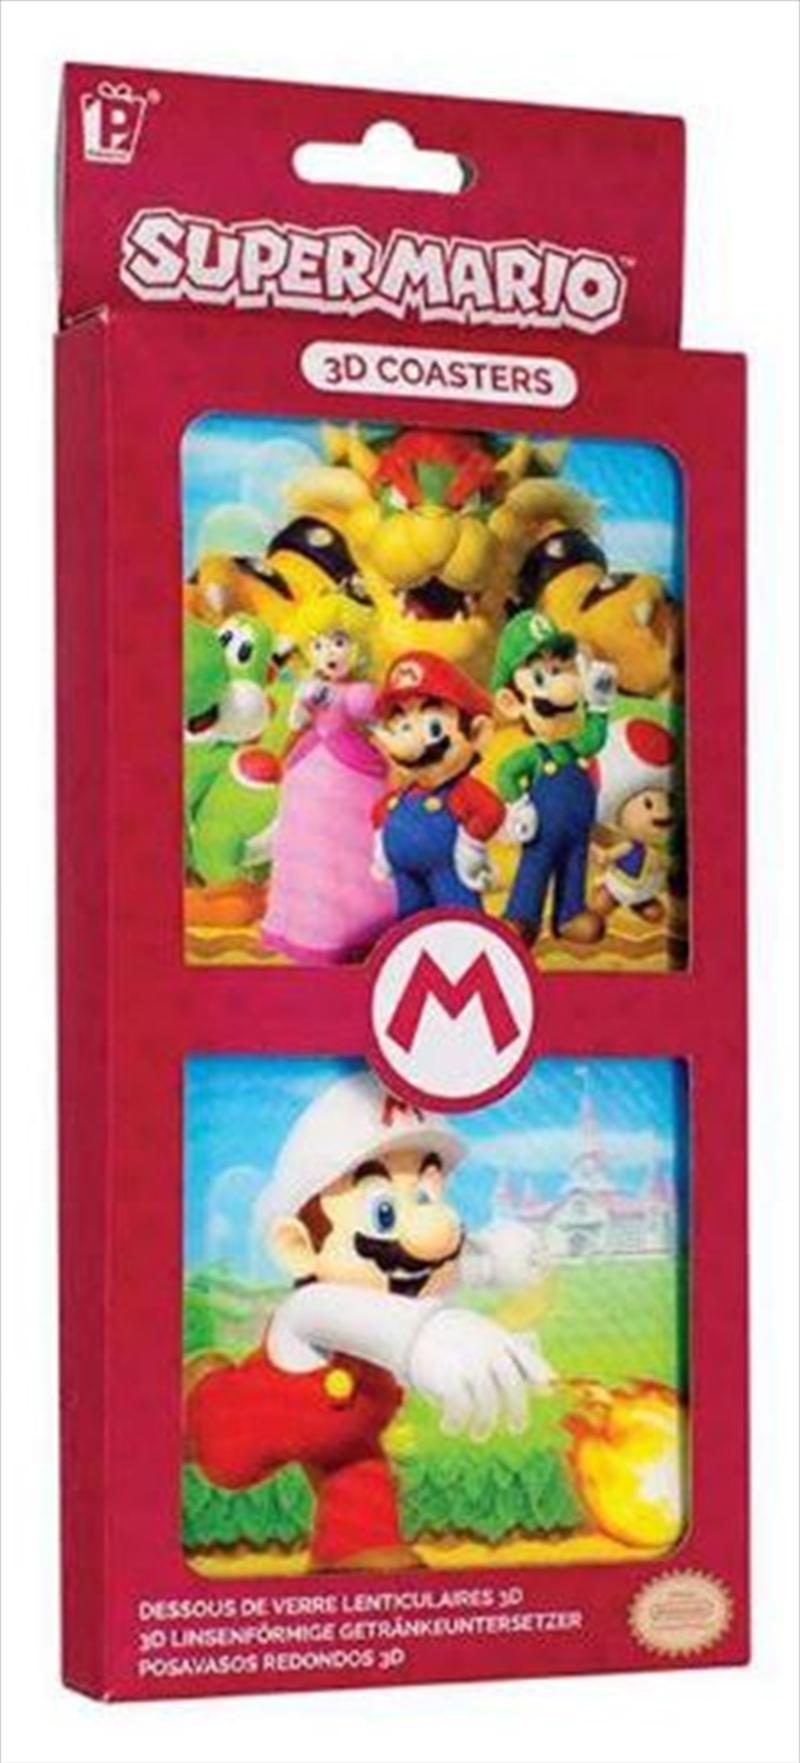 Super Mario 3D Coasters | Merchandise